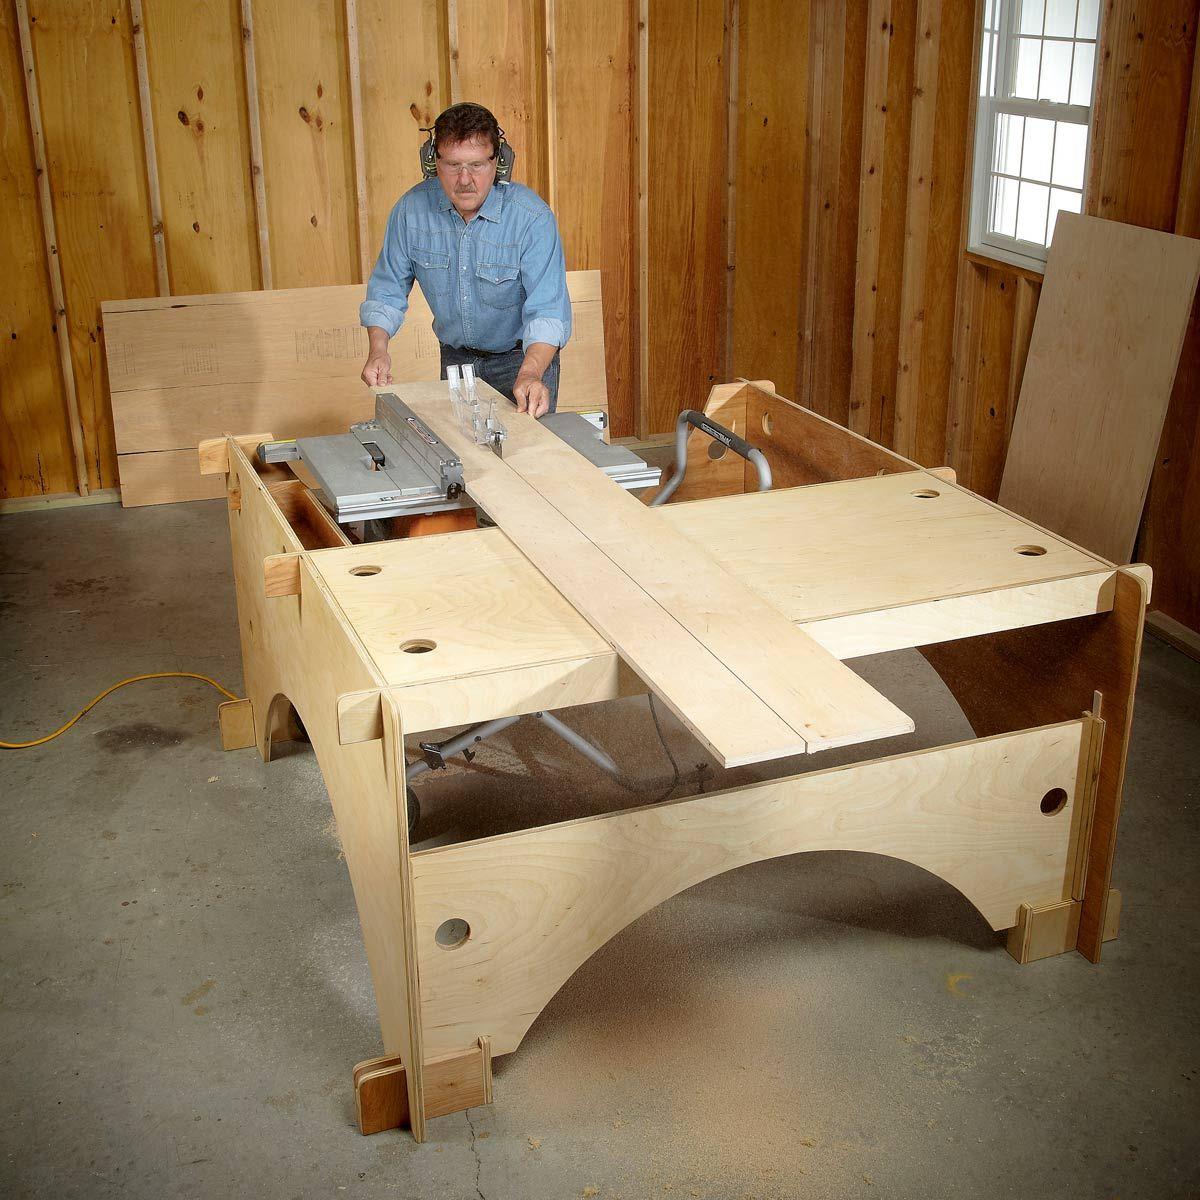 DIY Table Saw Table Diy table saw, Table saw